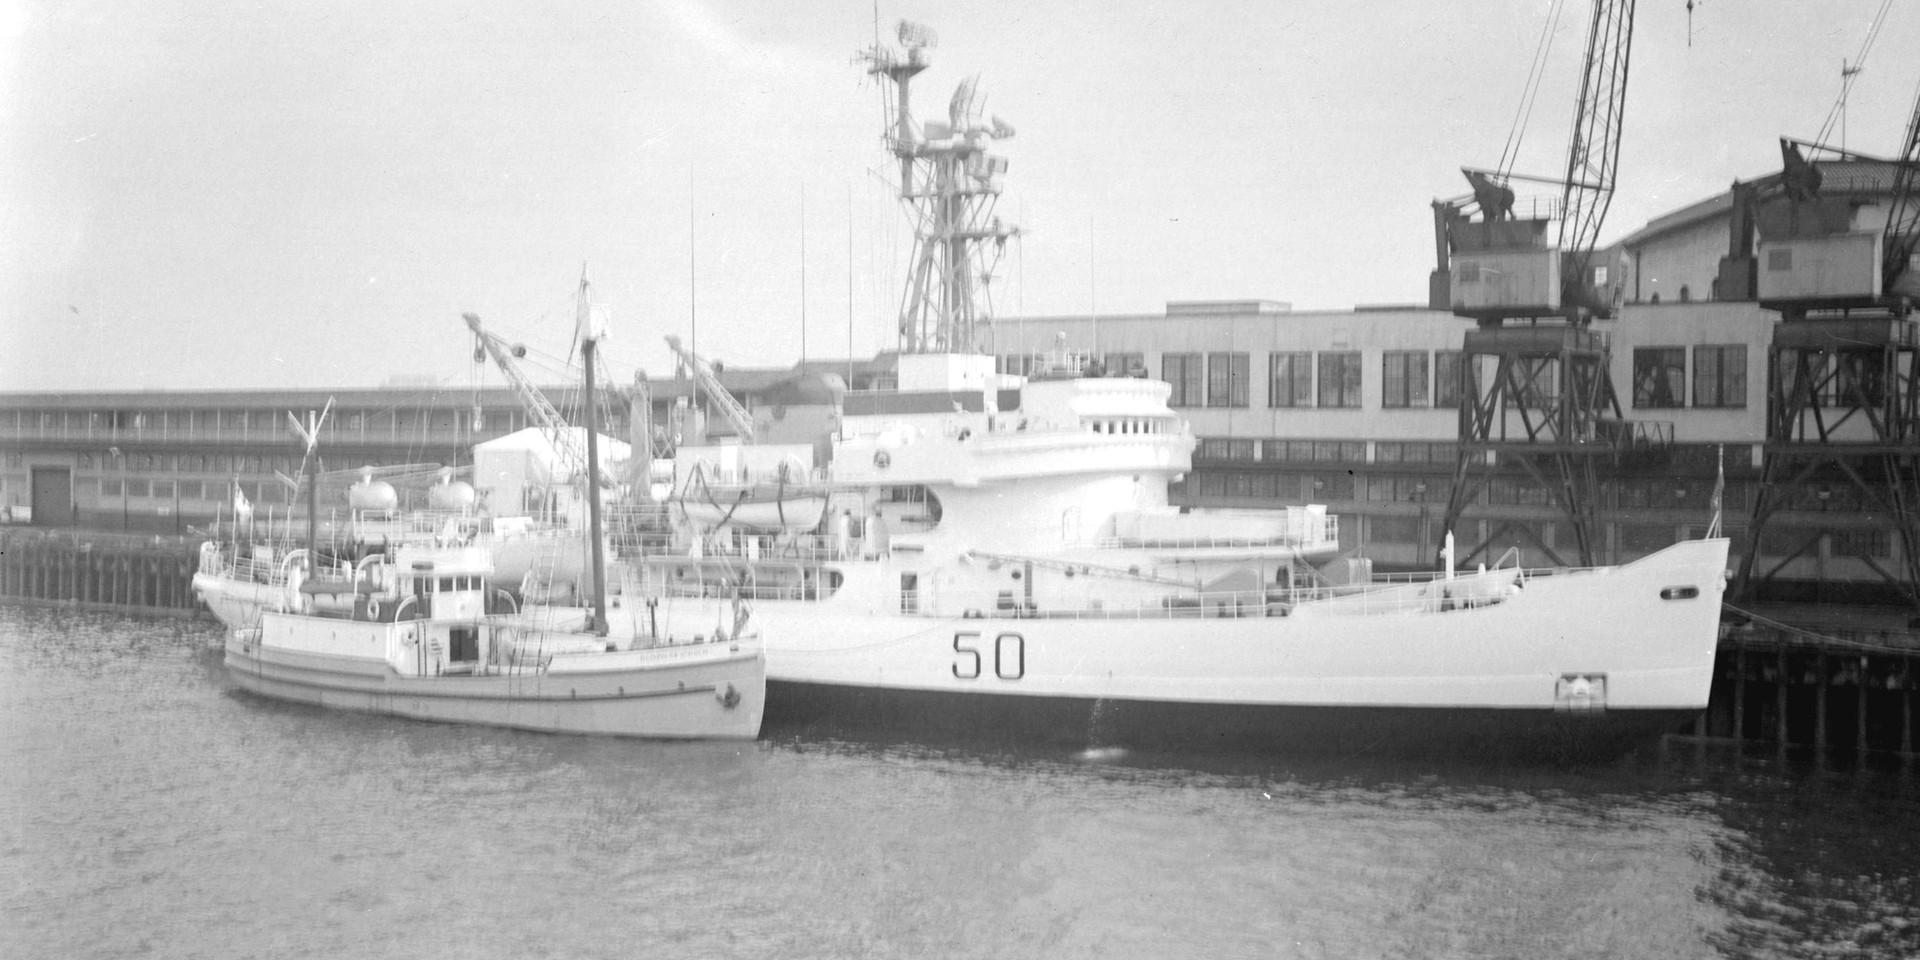 M.S. ST. ROCH & HMCS LABRADOR (1954)